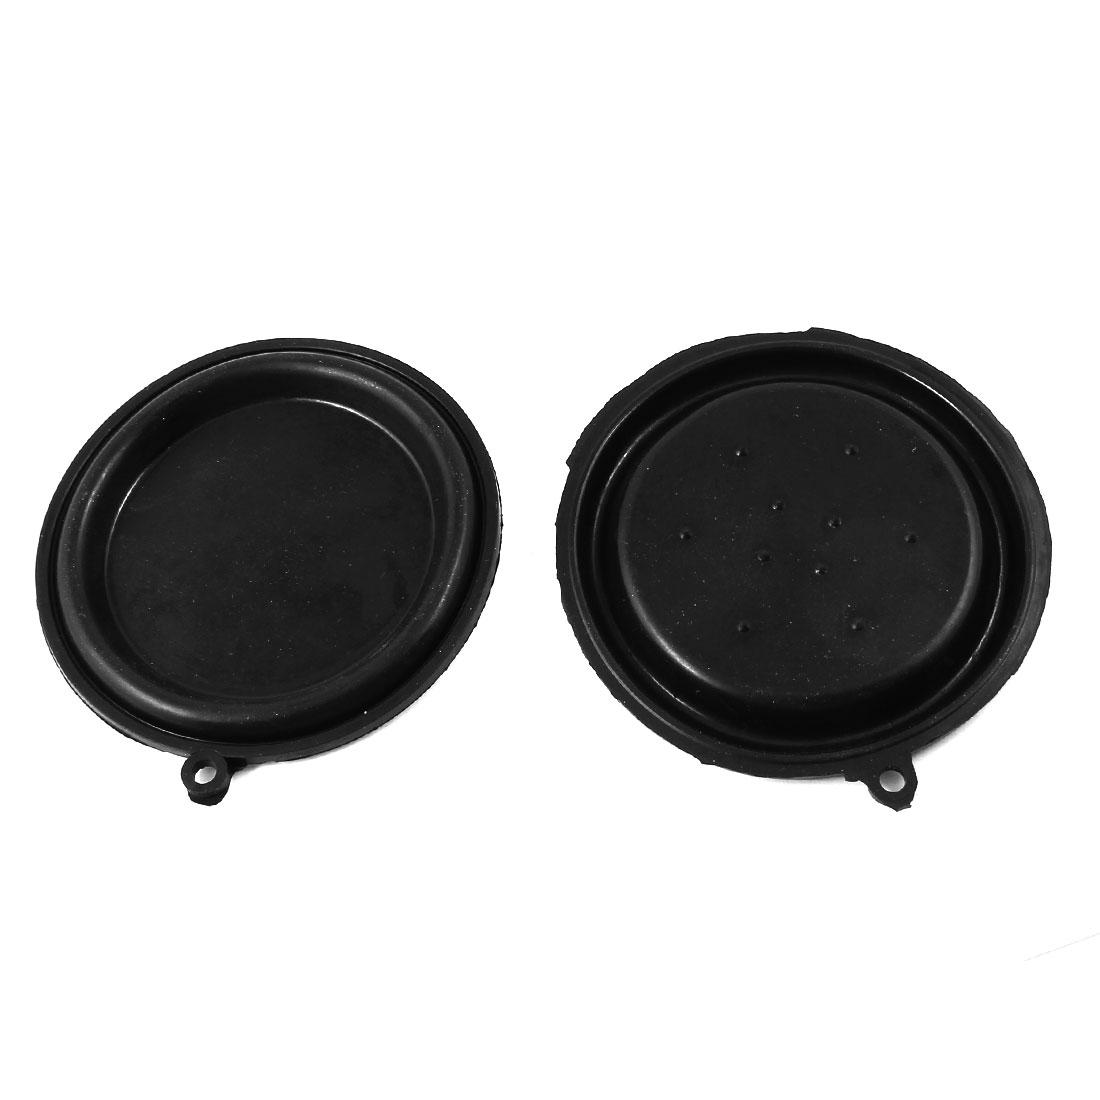 "2 Pcs 85mm 3.3"" Diameter Water Heater Diaphragms Seal Gasket Black"